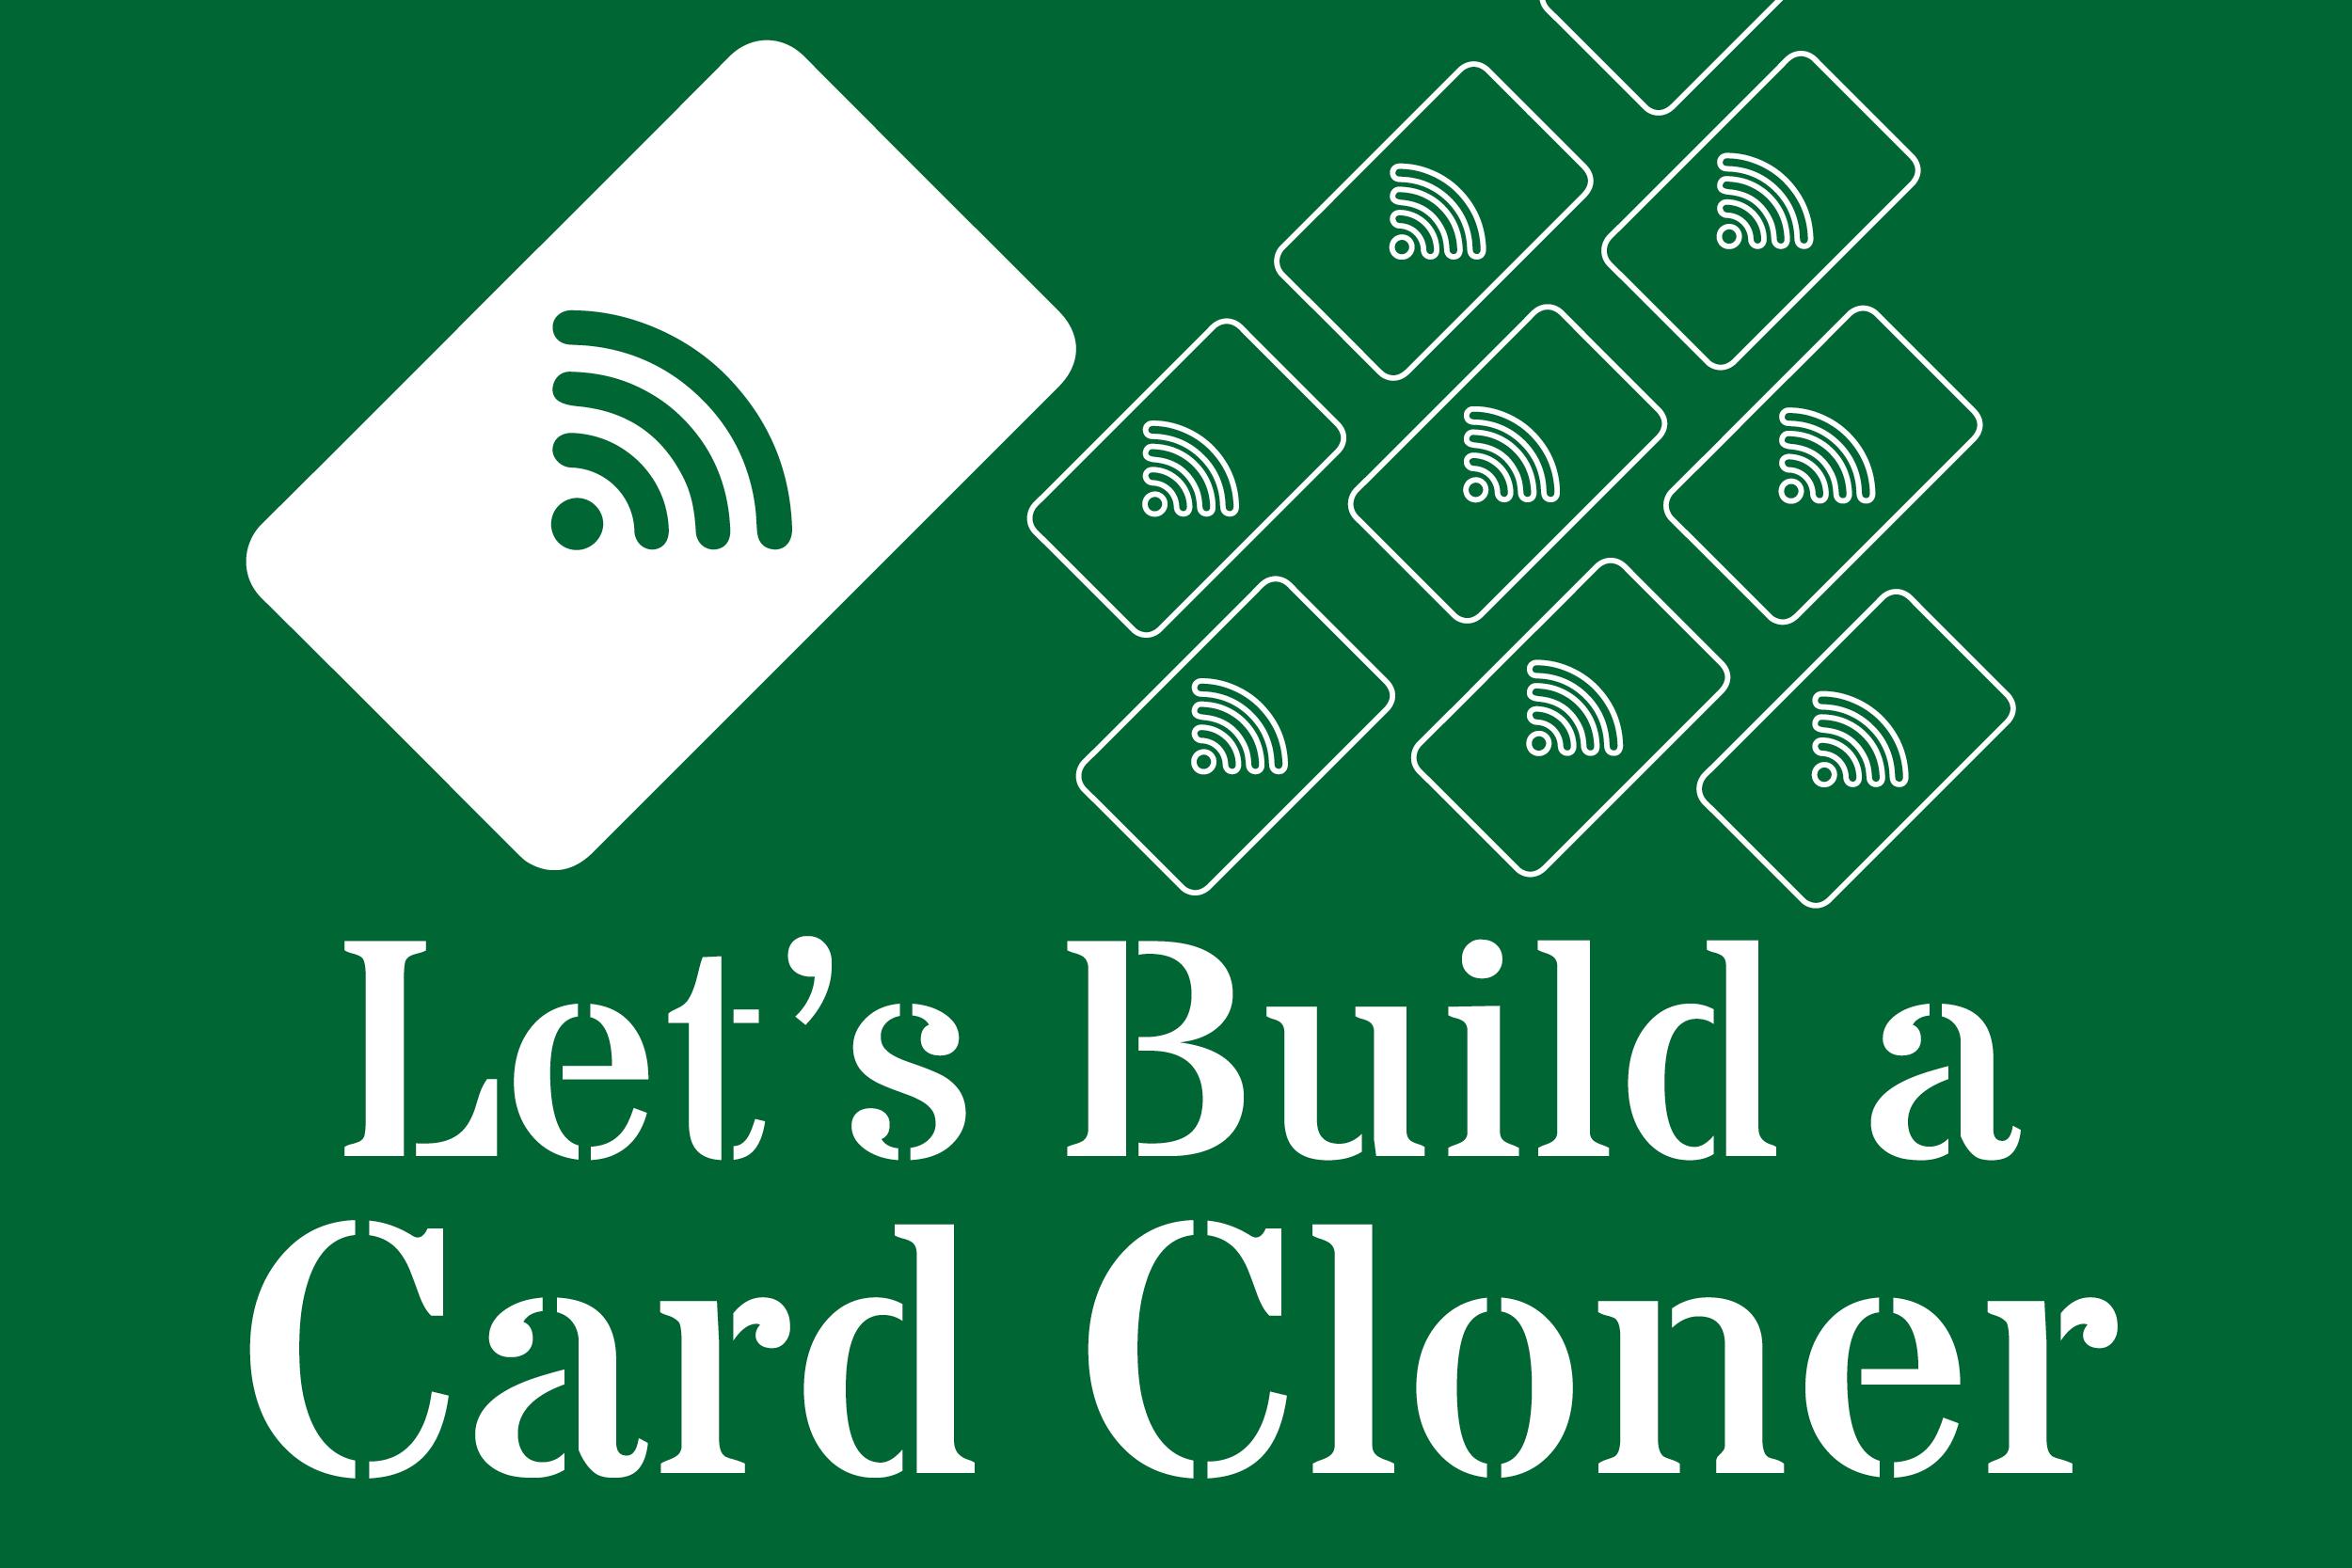 Let's Build a Card Cloner - TrustedSec